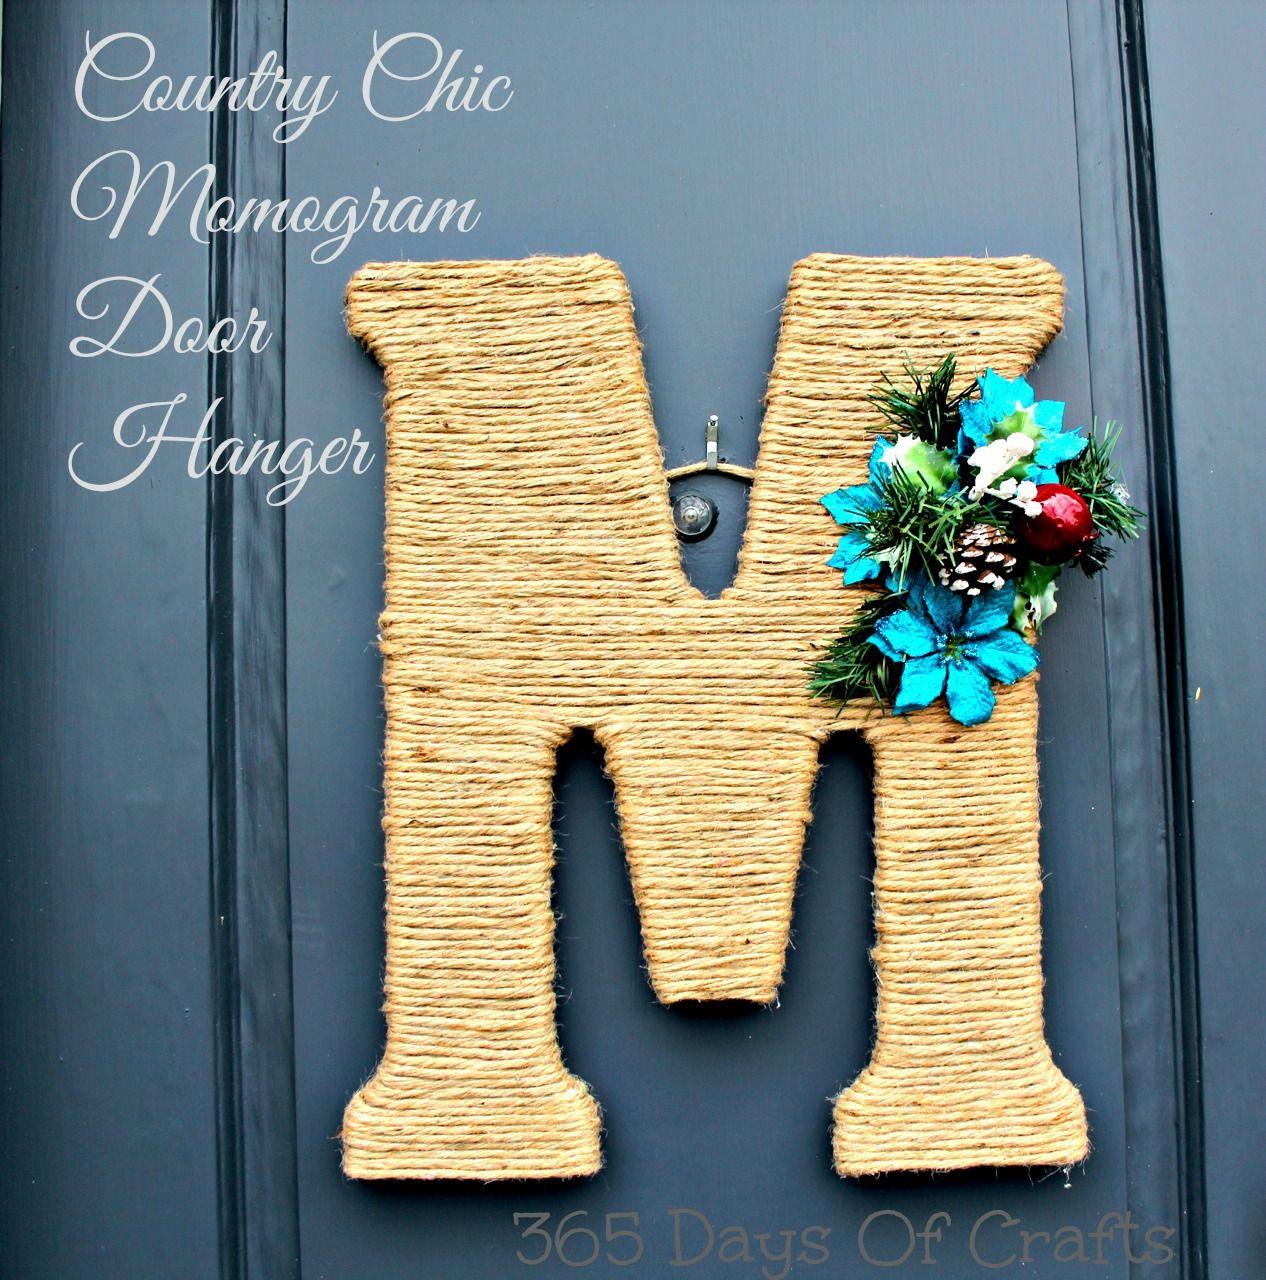 Country chic monogram wreath monogram door hanger twine or sisal wrapped around a wreath